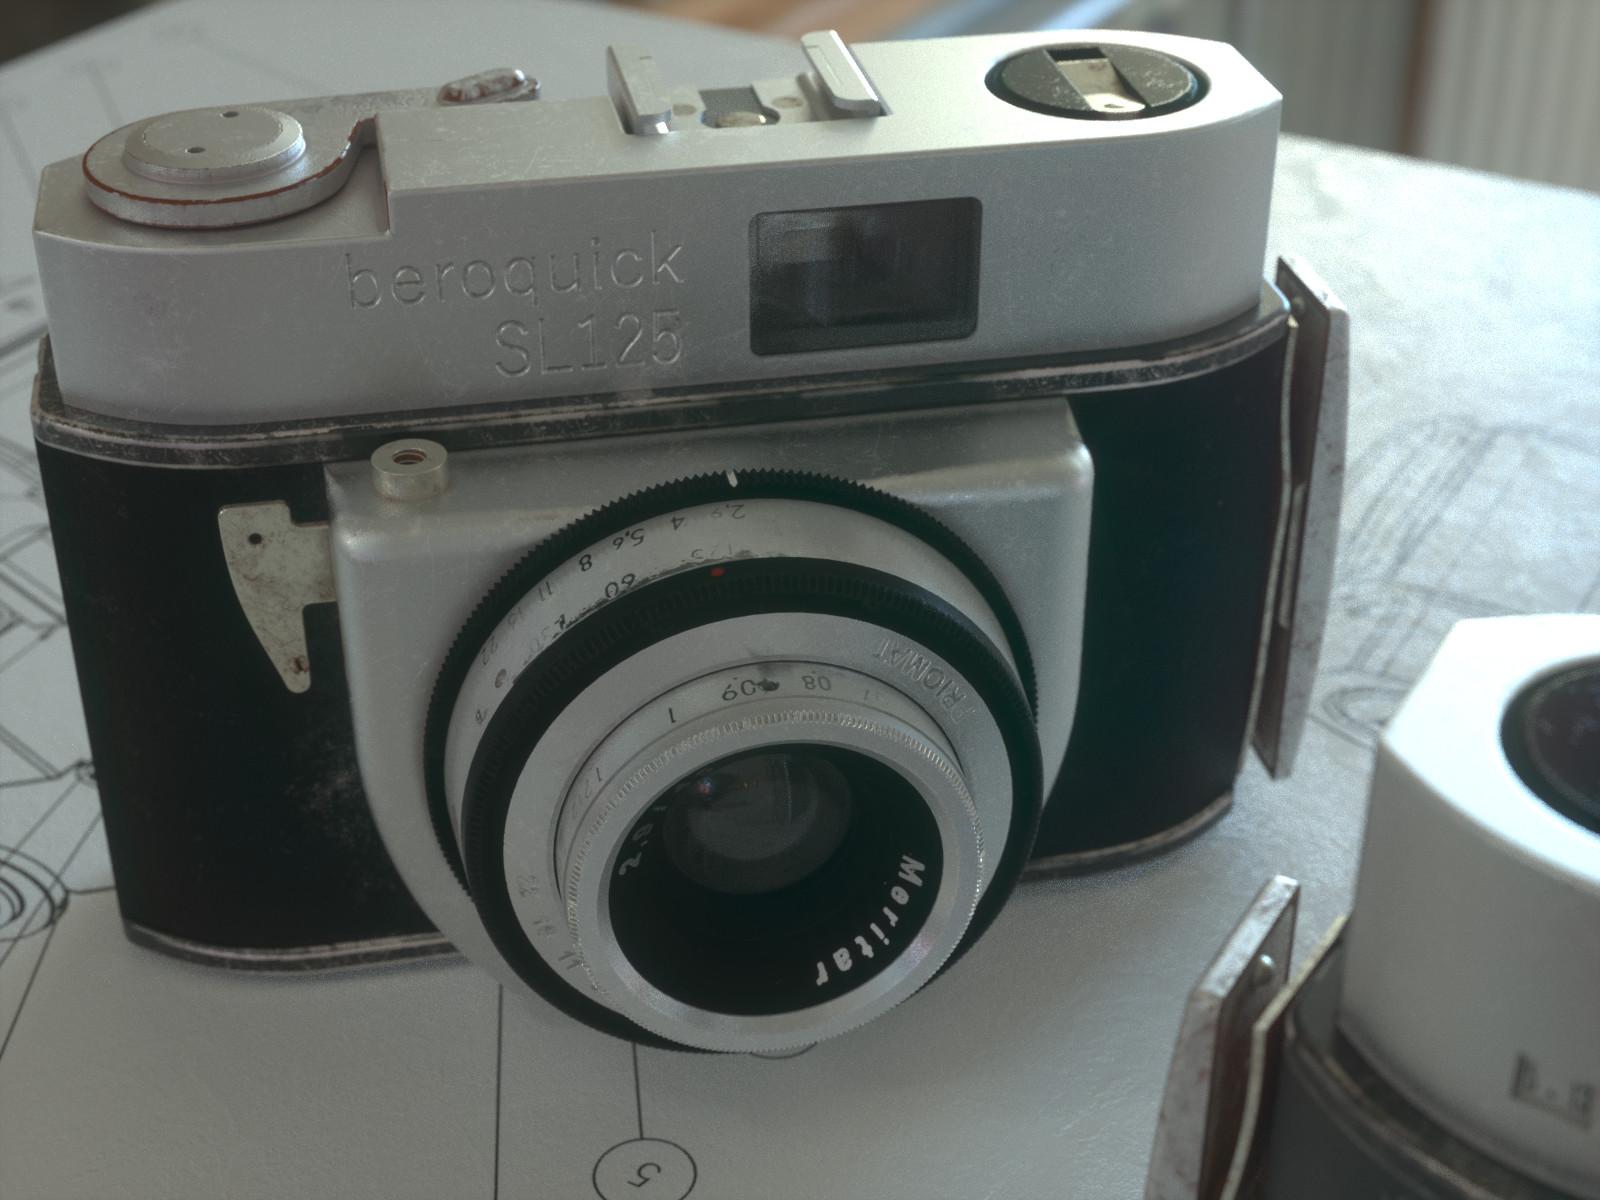 Nurbs Modeling - Vintage Camera Beroquick SL125